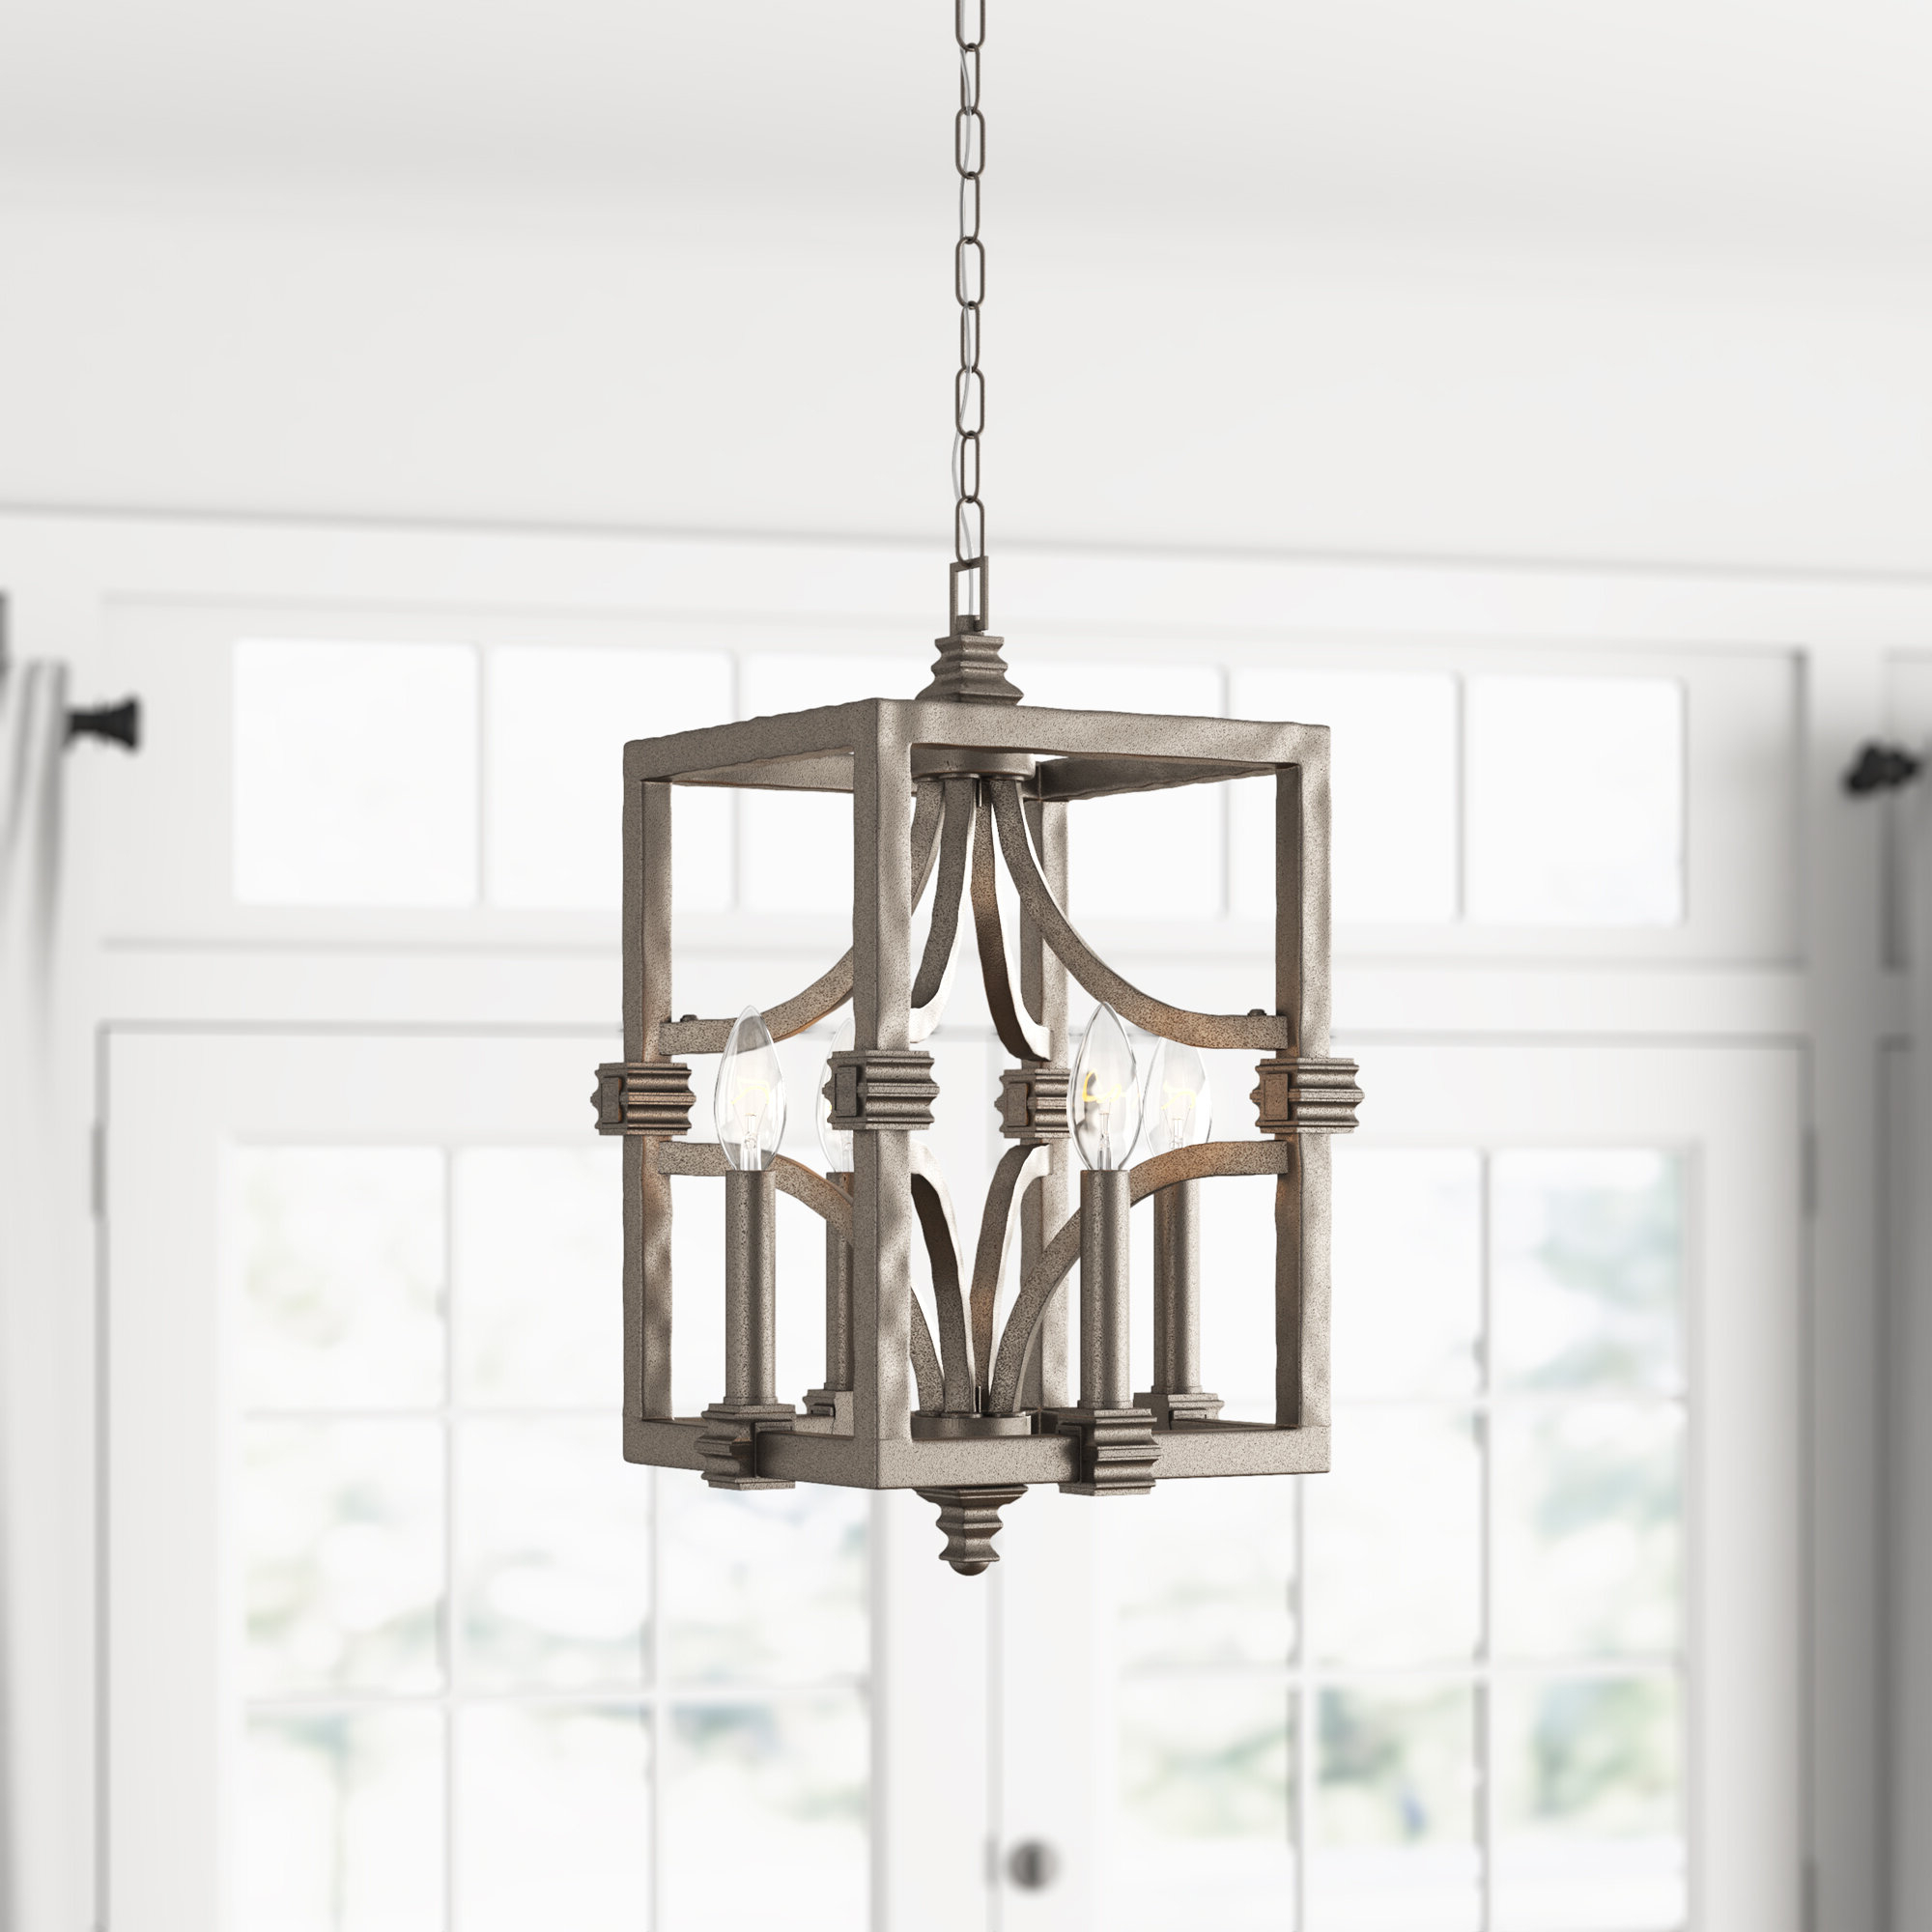 Fashionable Freeburg 4 Light Lantern Square / Rectangle Pendant In 4 Light Lantern Square / Rectangle Pendants (Gallery 5 of 20)